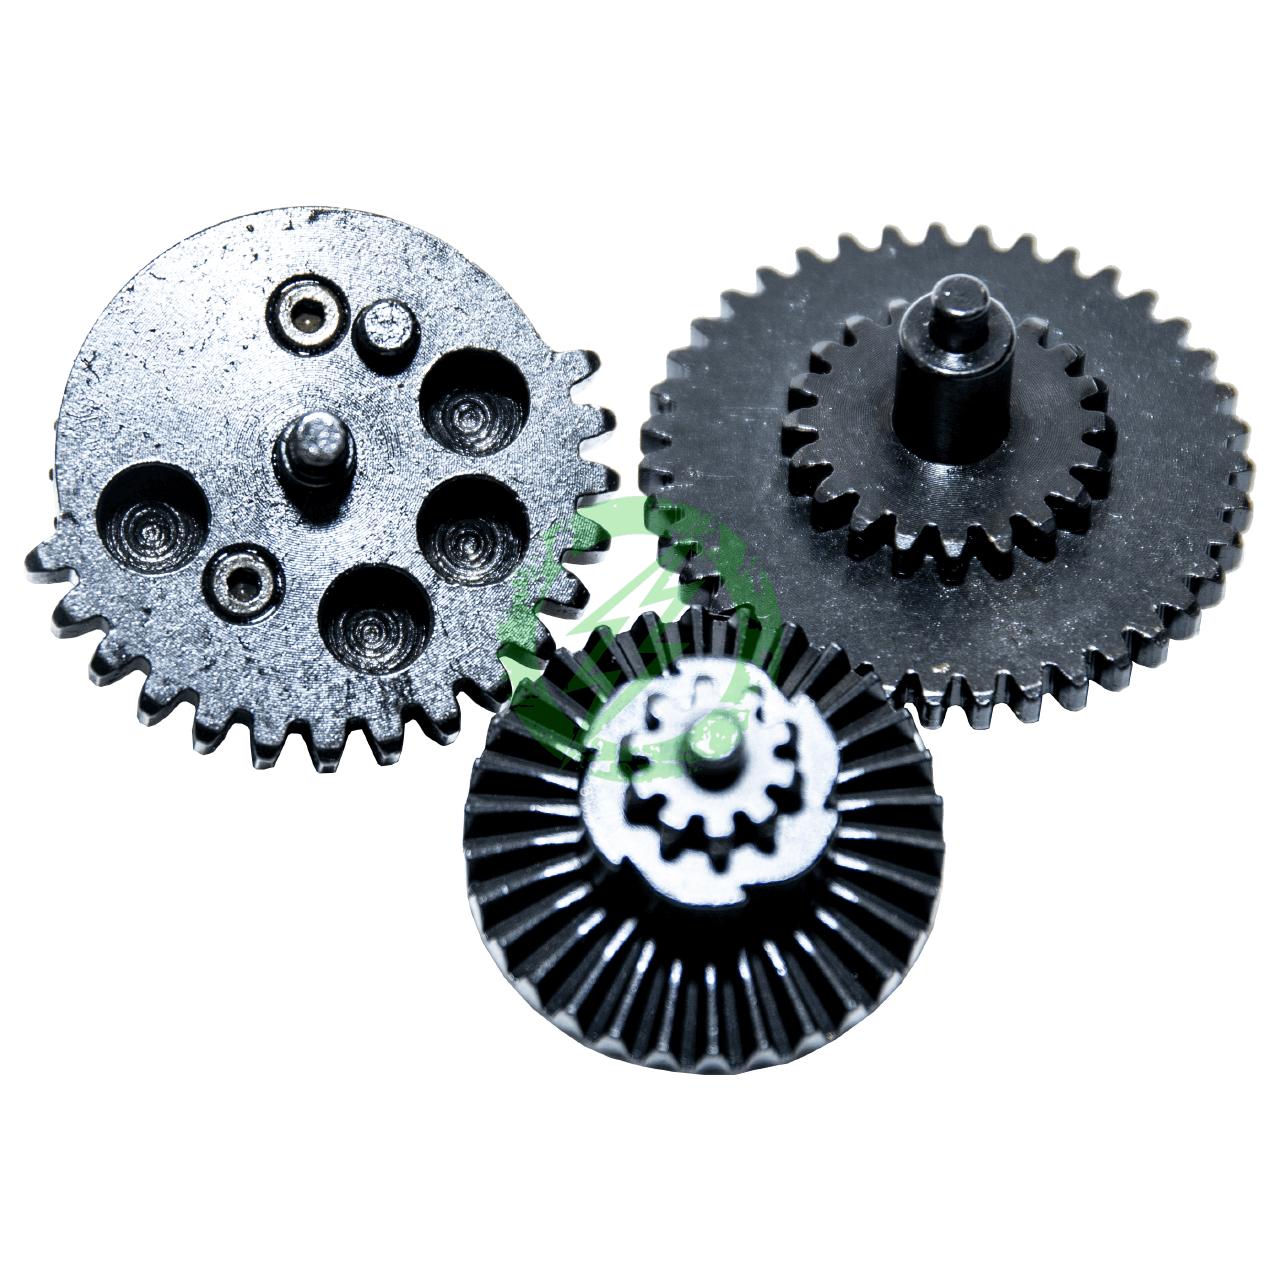 Rocket Airsoft CNC Gear Sets | 13:1